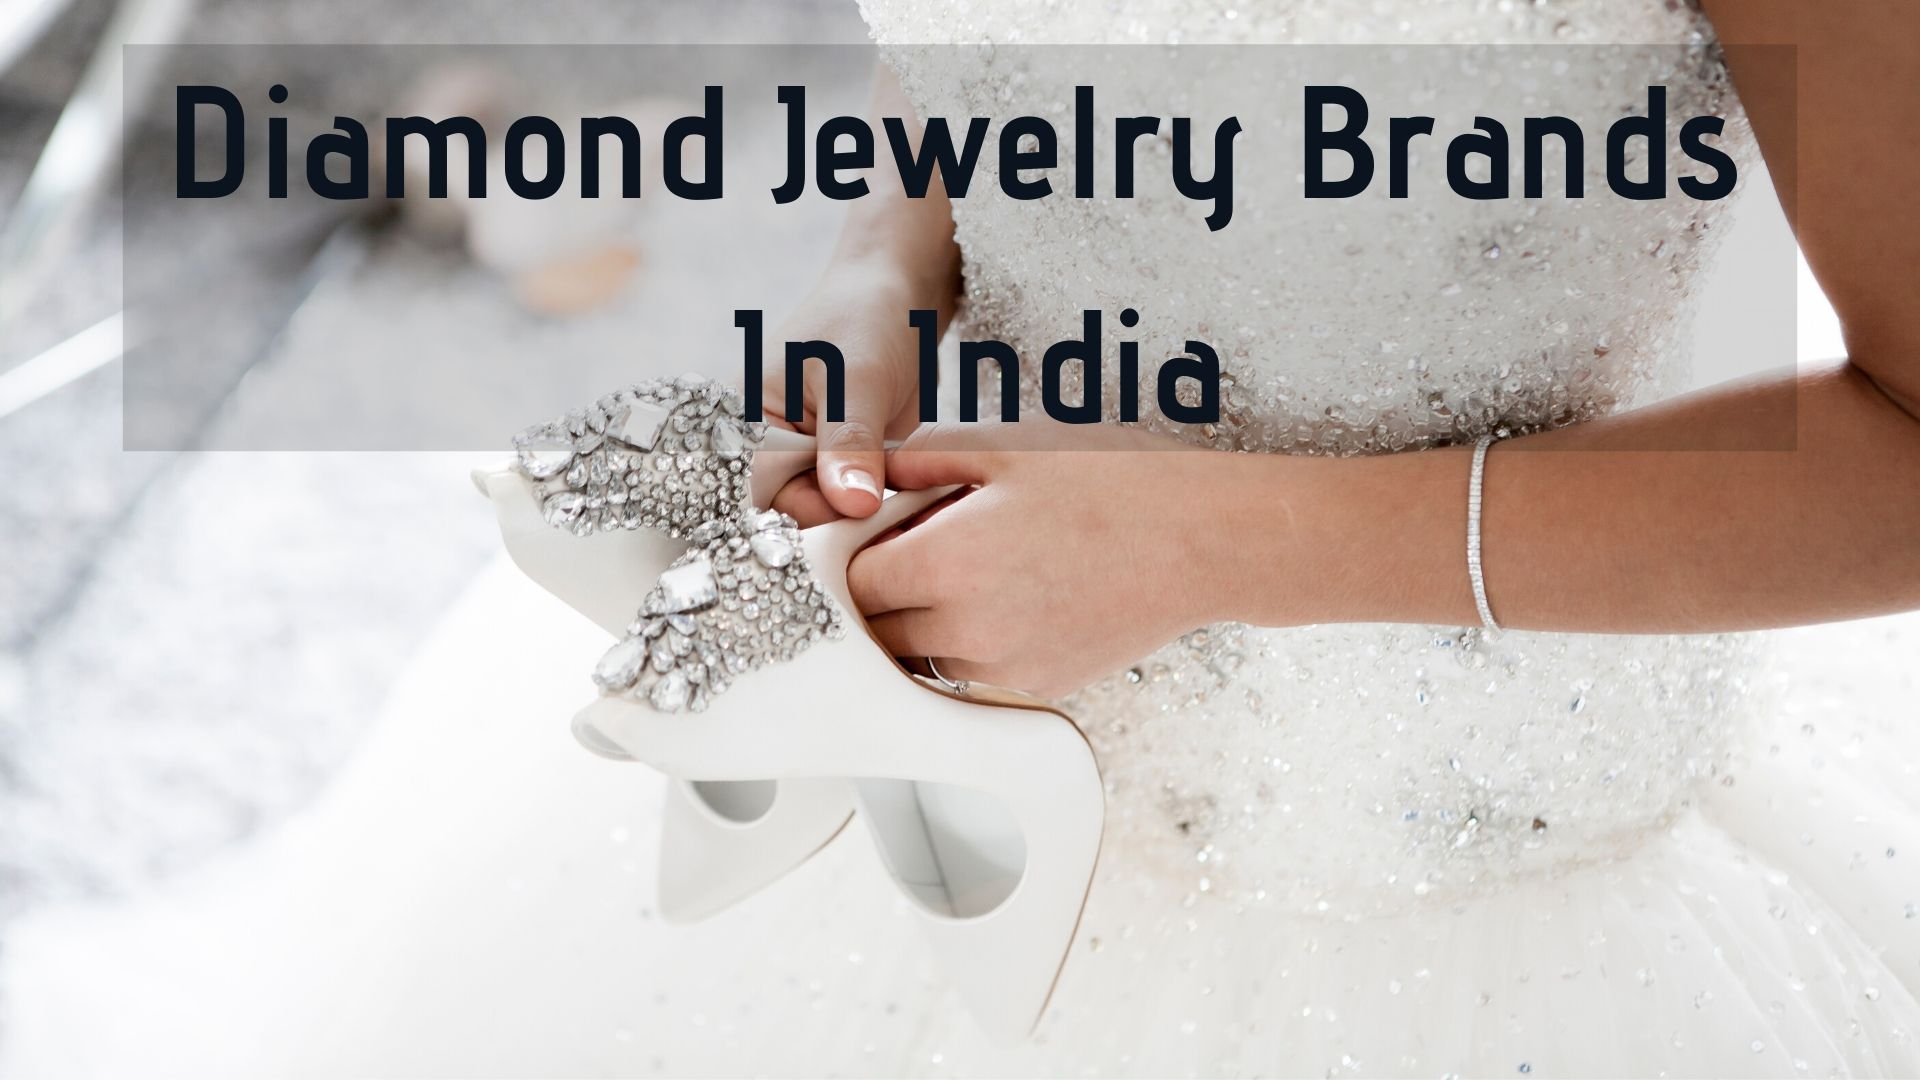 Diamond Jewelry Brands In India